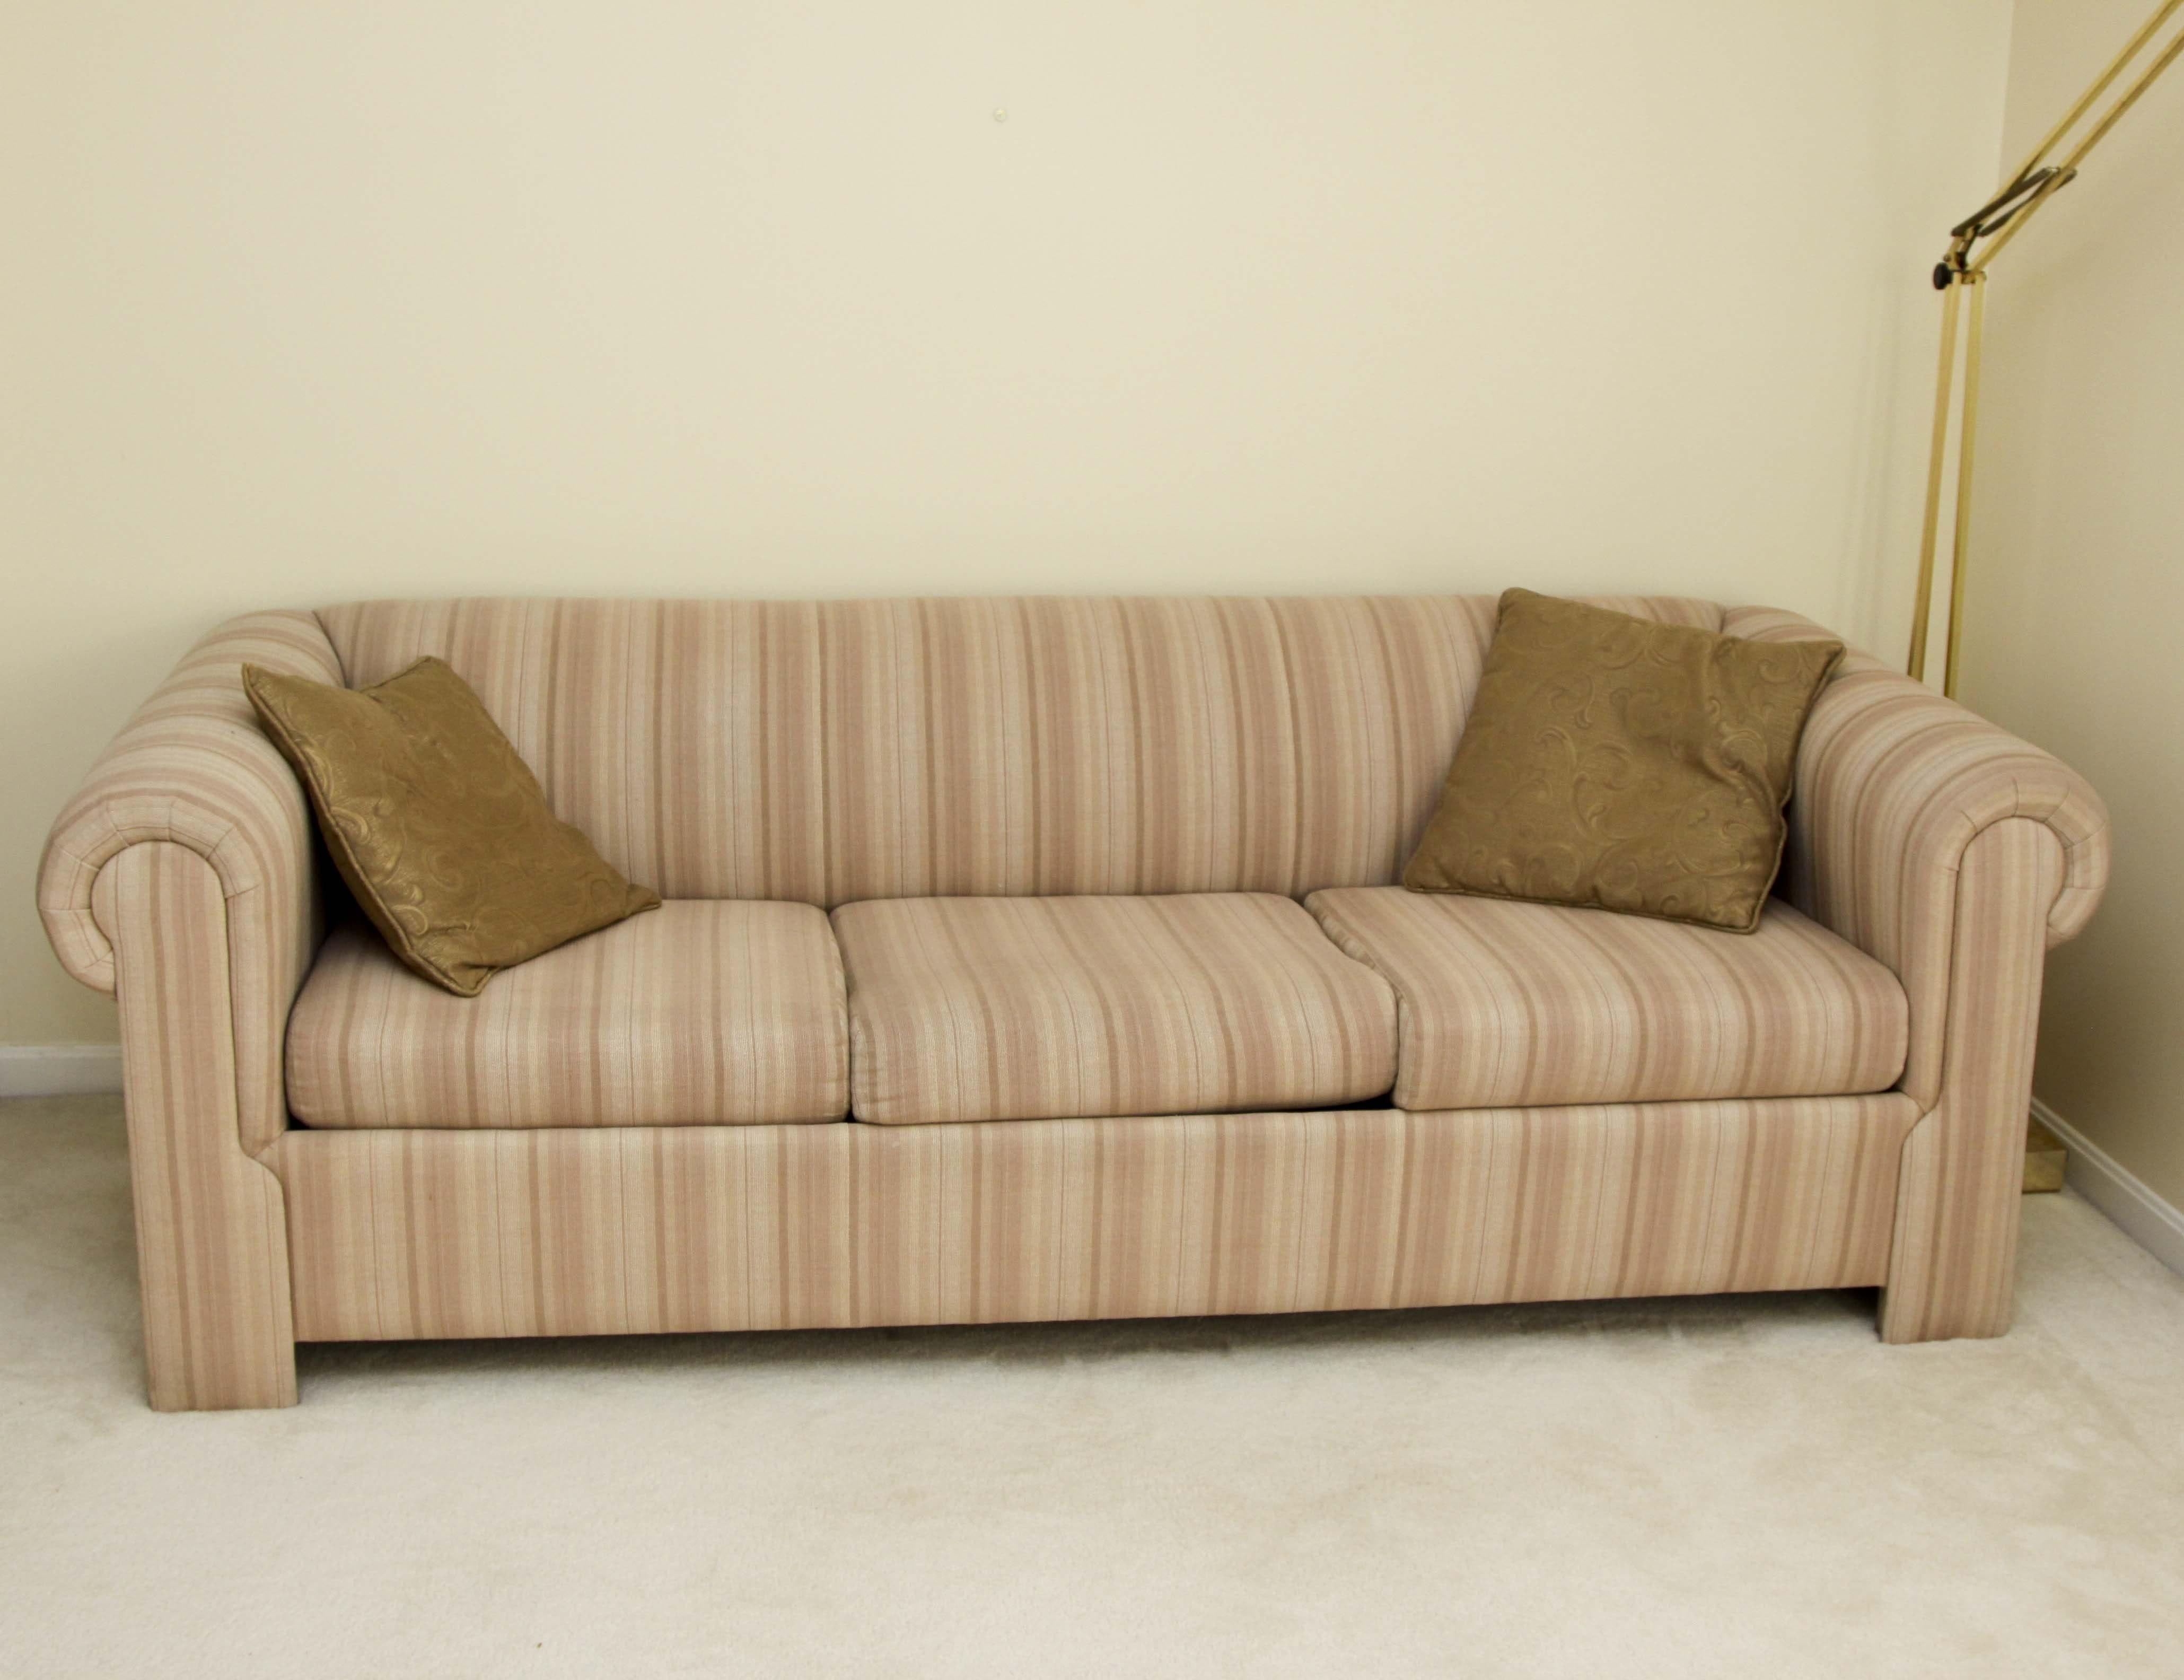 Vintage Sofas Antique Settees Retro Loveseats and Antique Chaises EBTH